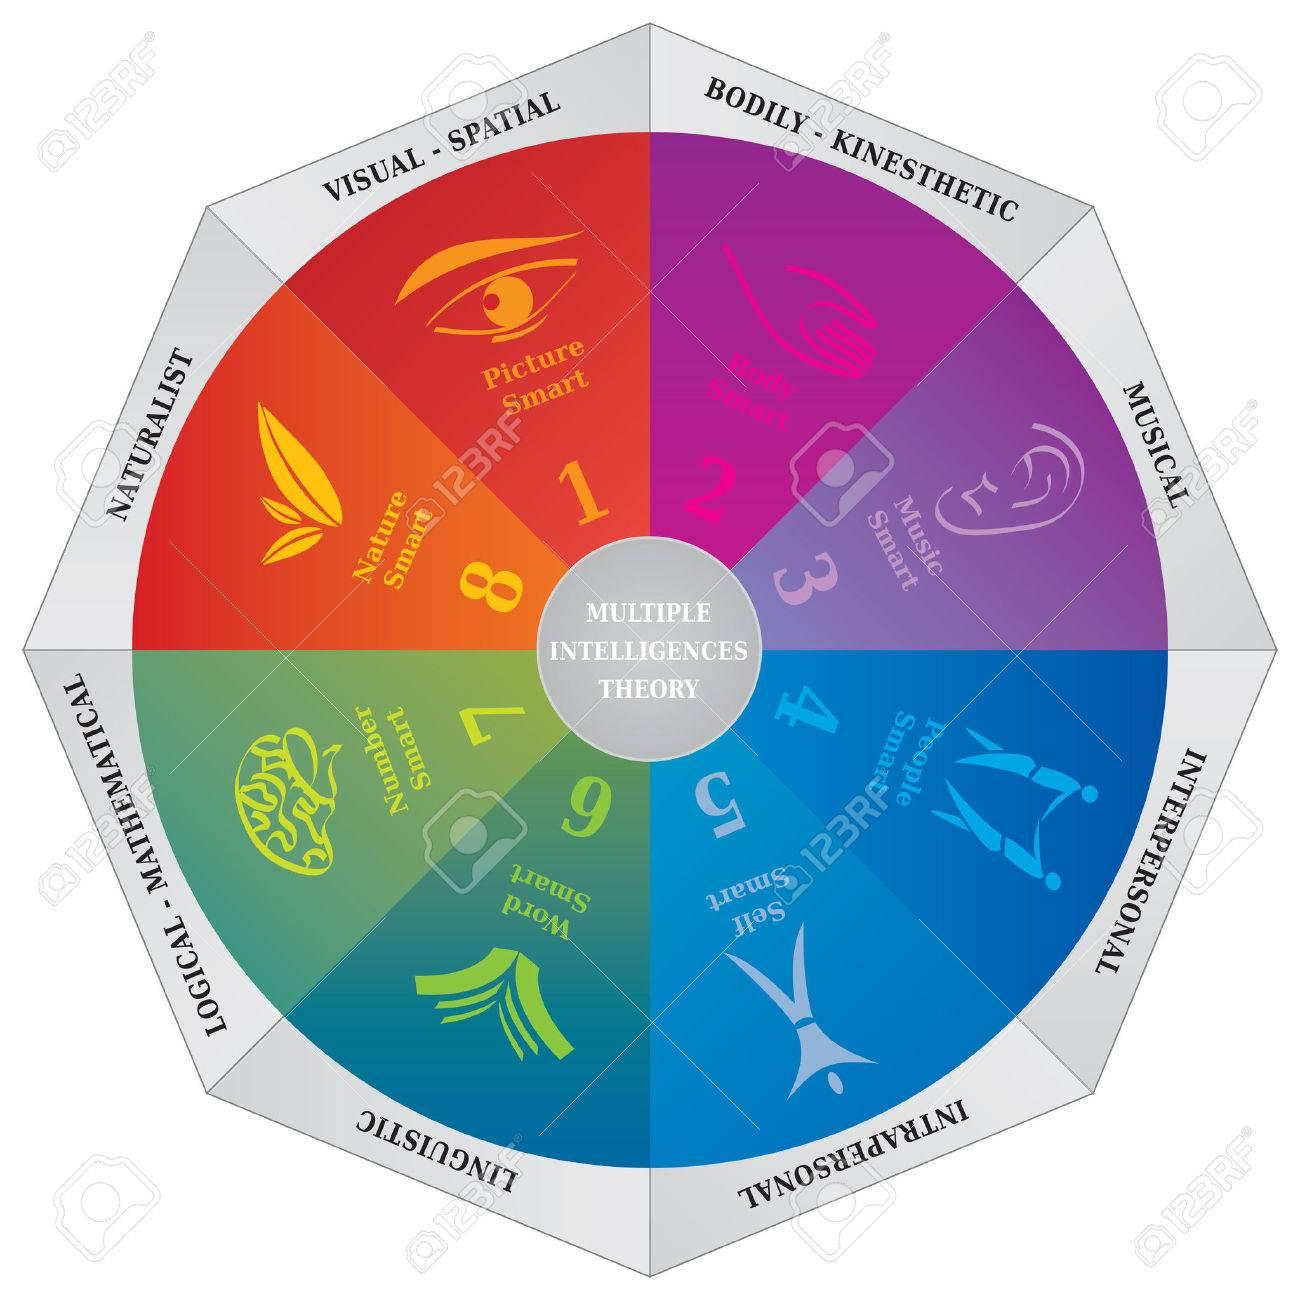 Gardners multiple intelligences theory diagram wheel coaching gardners multiple intelligences theory diagram wheel coaching tool imagens 70329904 ccuart Choice Image